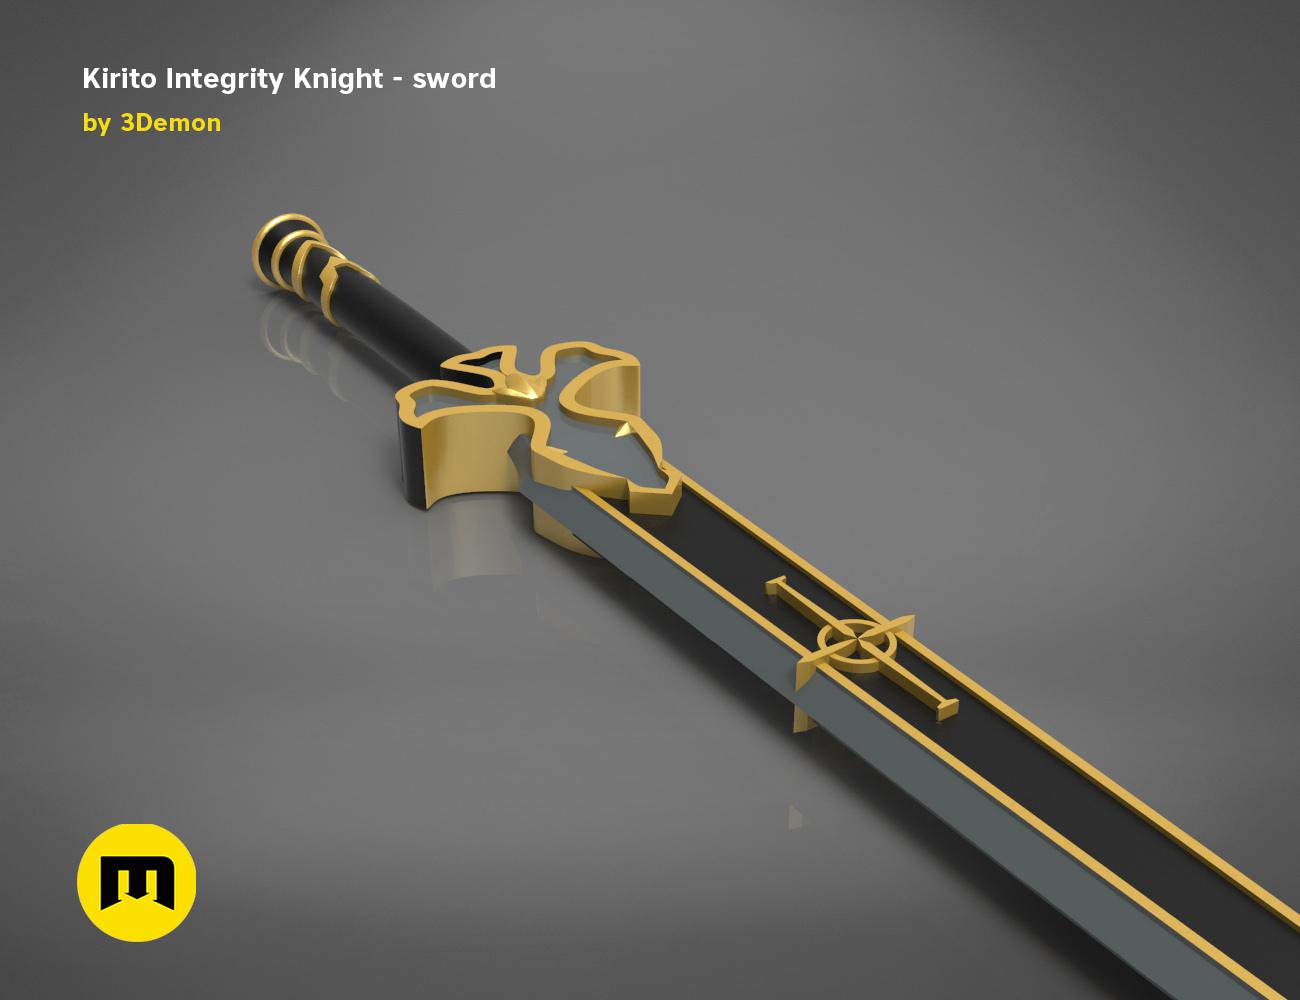 render_scene_Integrity-knight-sword.13 kopie.jpg Download STL file Kirito's Sword - Integrity Knight • 3D print model, 3D-mon